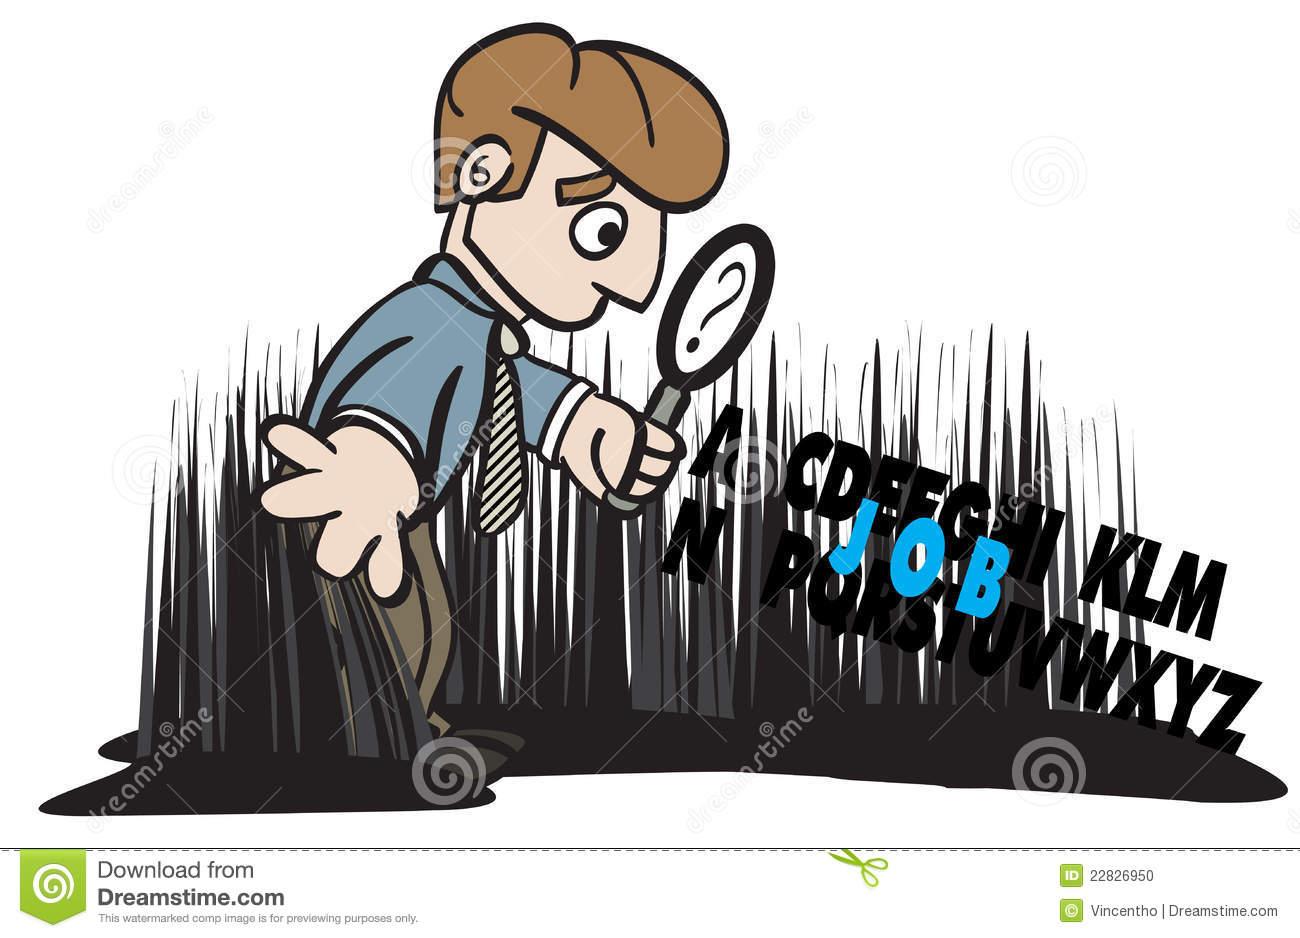 Job Seeker Looking Seeking For Job Illustration Stock Photo.